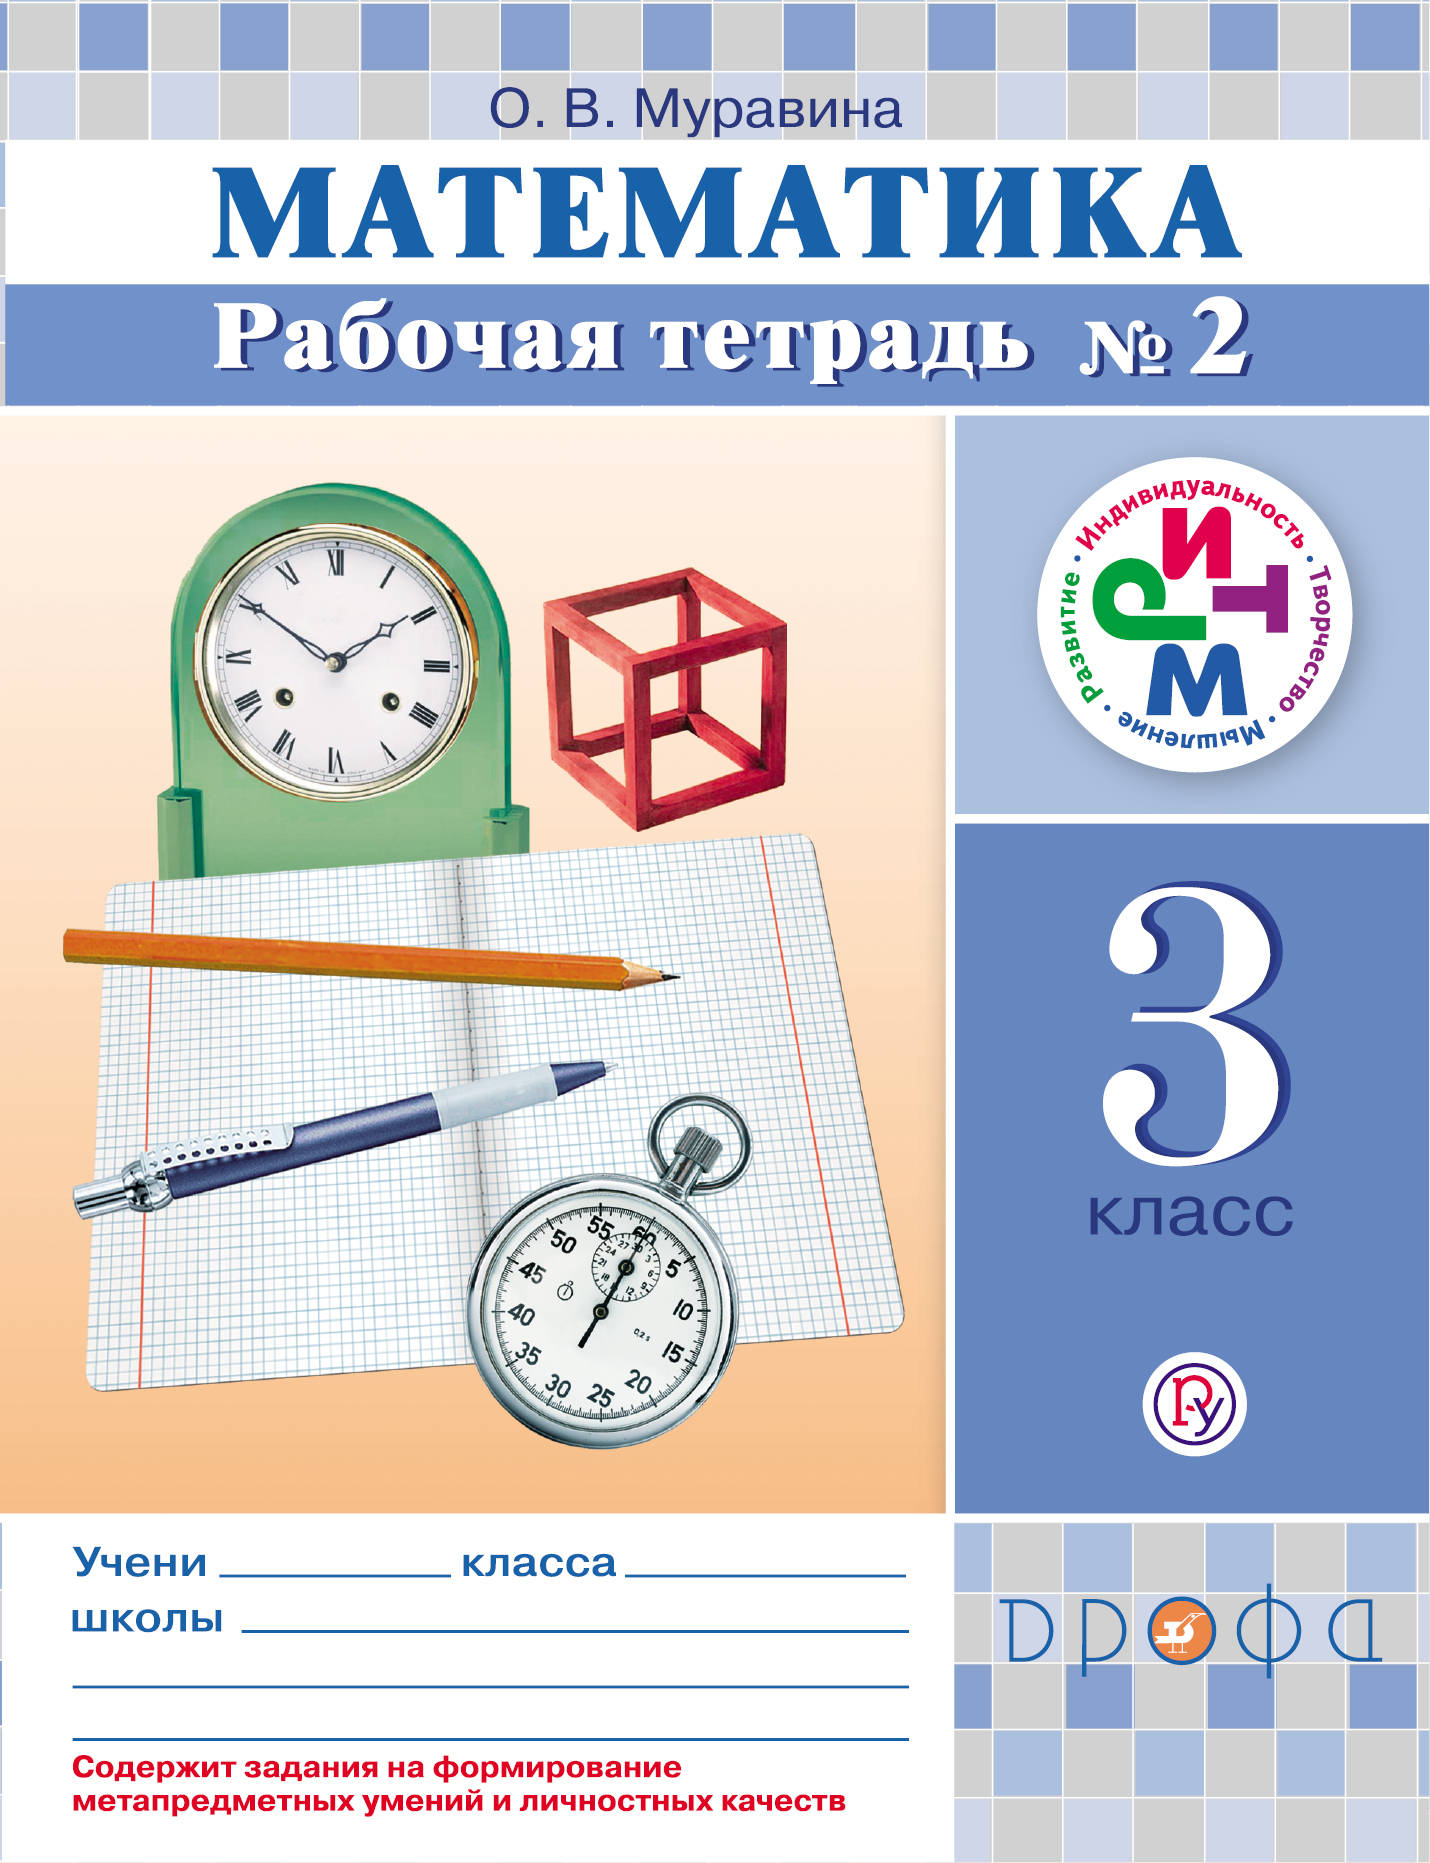 Математика. 3 кл. Рабочая тетрадь. №2 РИТМ